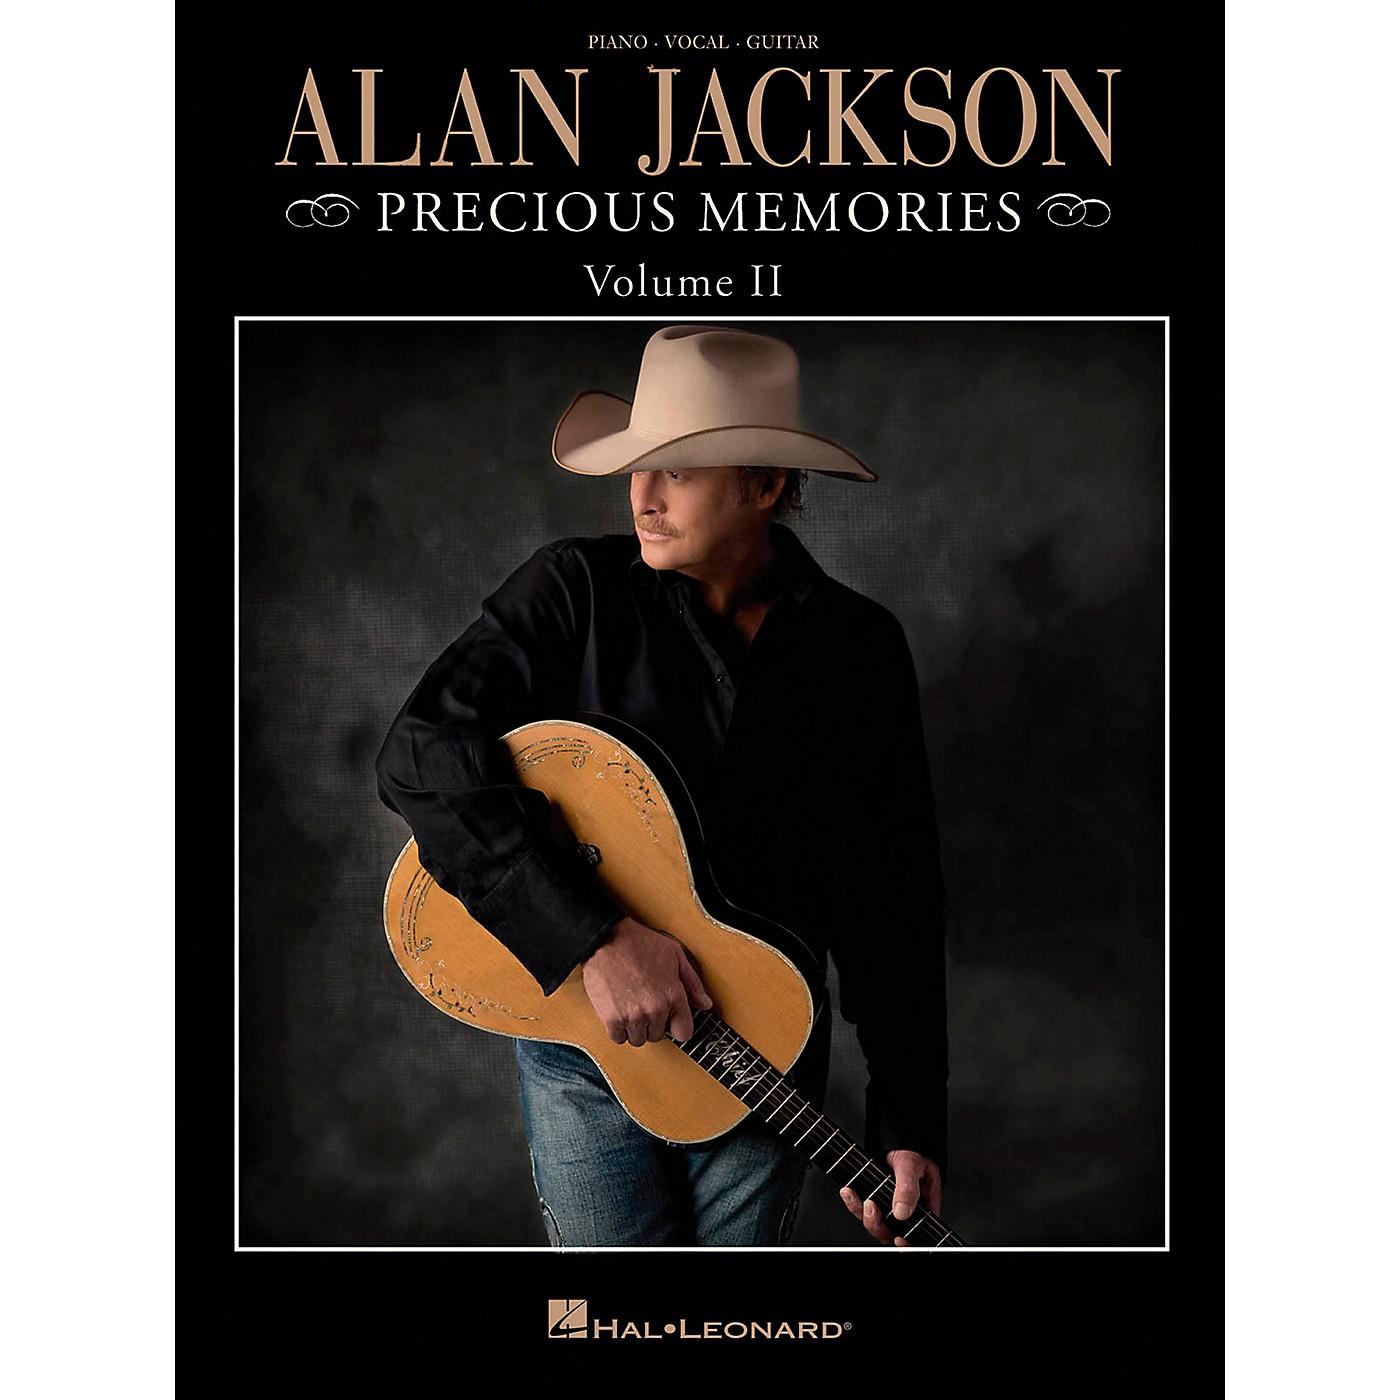 Hal Leonard Alan Jackson - Precious Memories Volume 2 for Piano/Vocal/Guitar (P/V/G) thumbnail